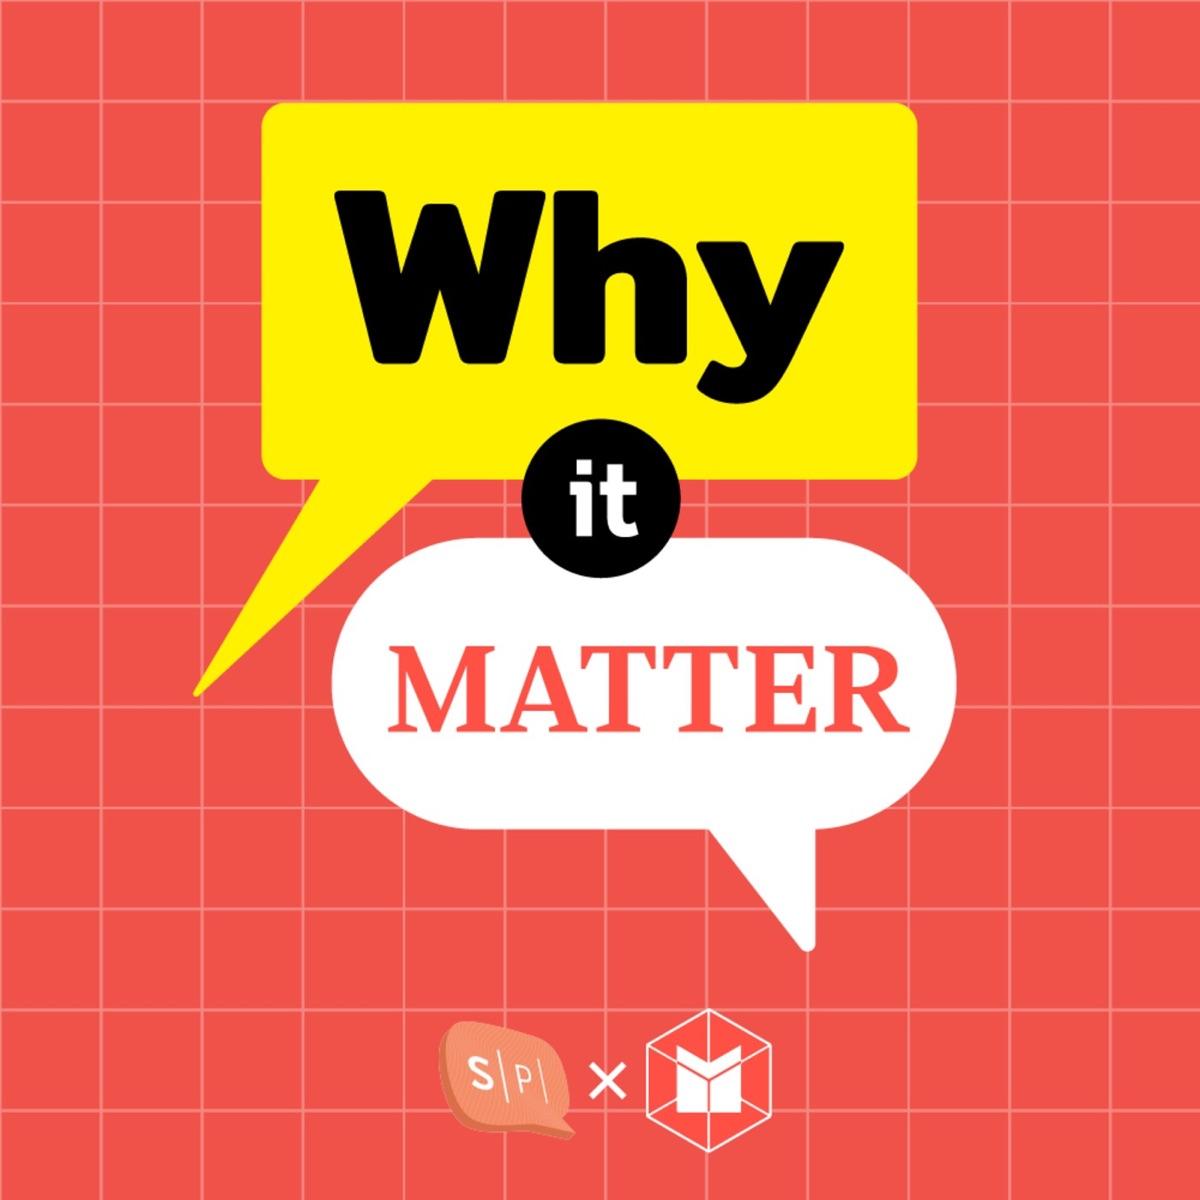 Why It MATTERs คุยข่าวให้เกี่ยวกับคุณ